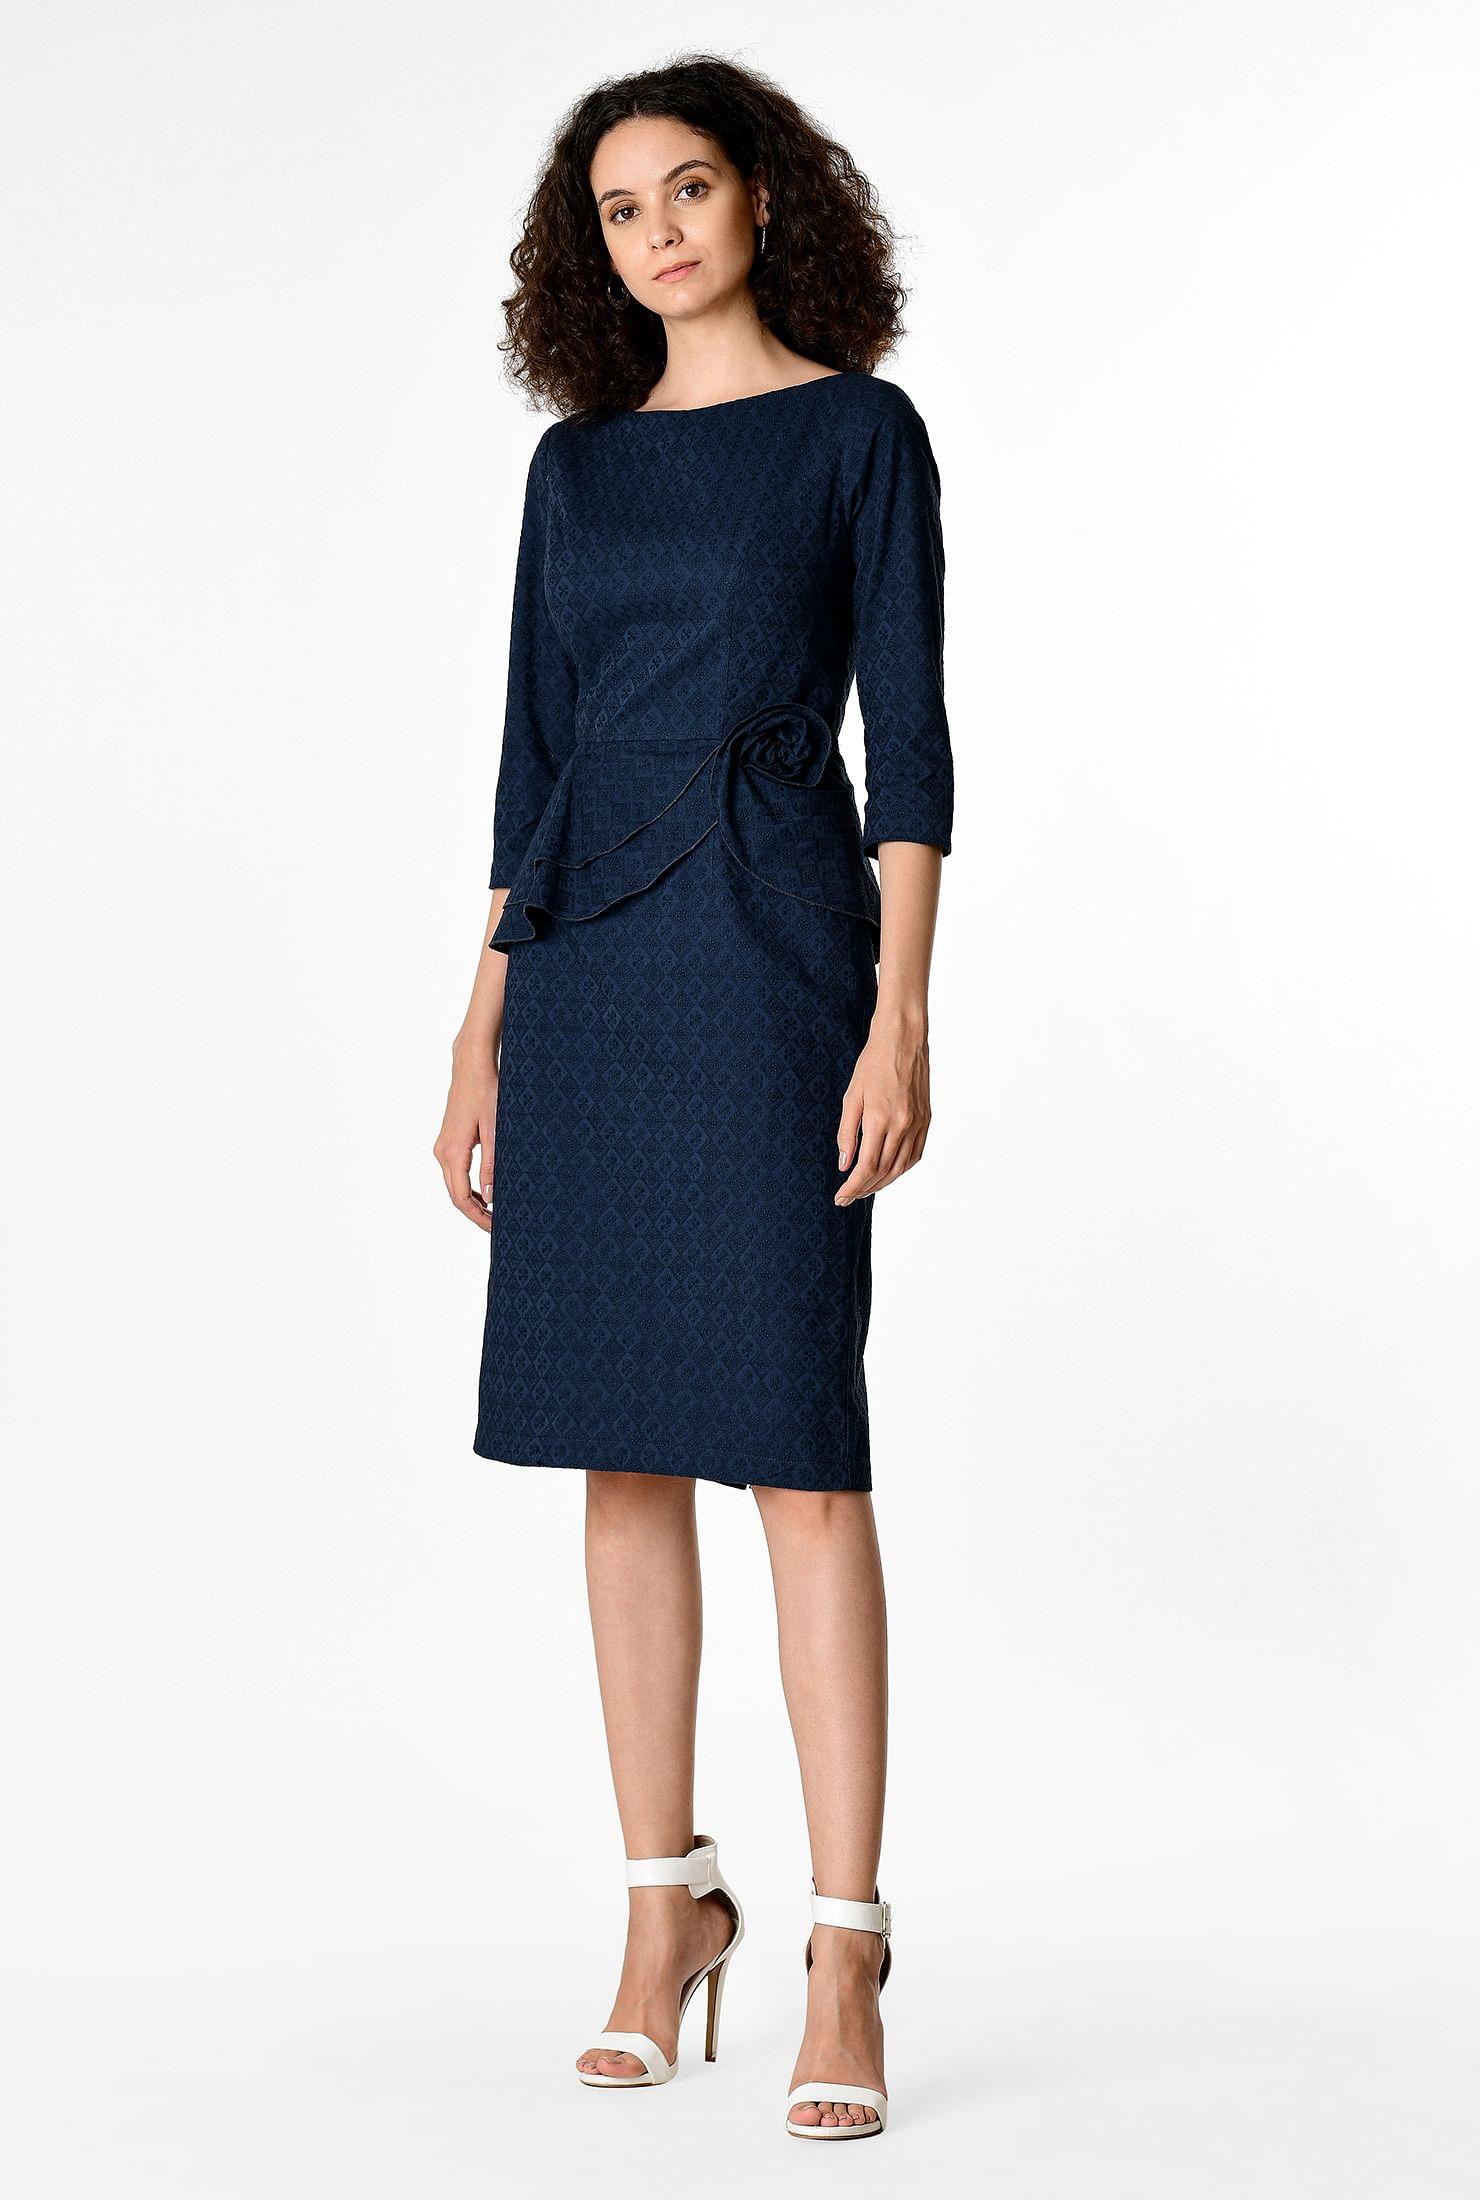 e4e5c5aa5d1be Floral eyelet cotton peplum flounce sheath dress